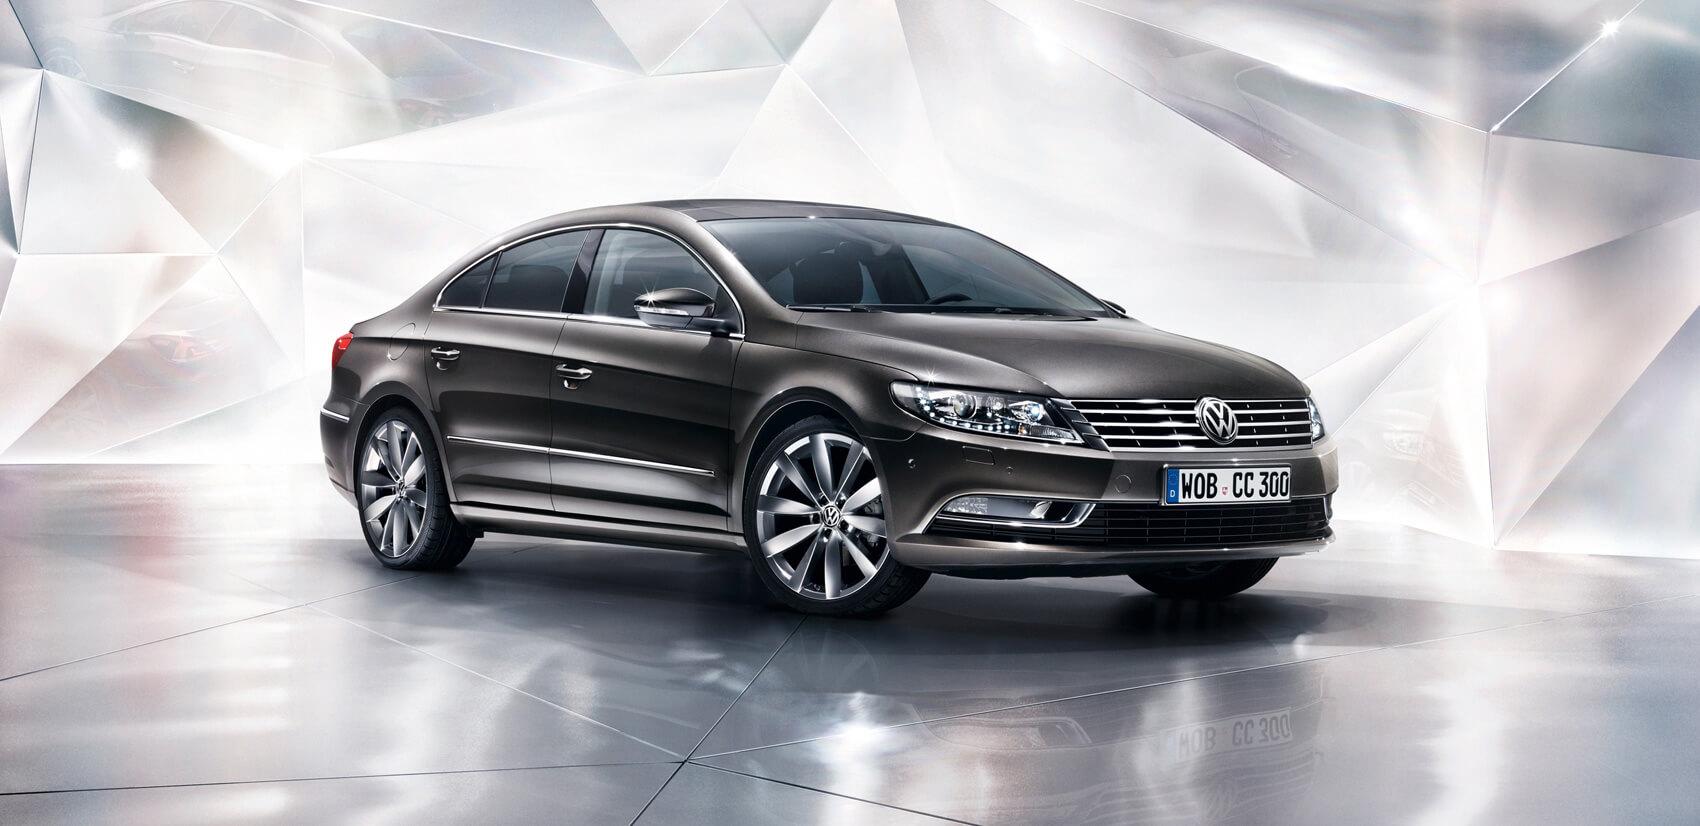 Volkswagen 2015 Fiyat Listesi Caddy - New Car Release Date ...